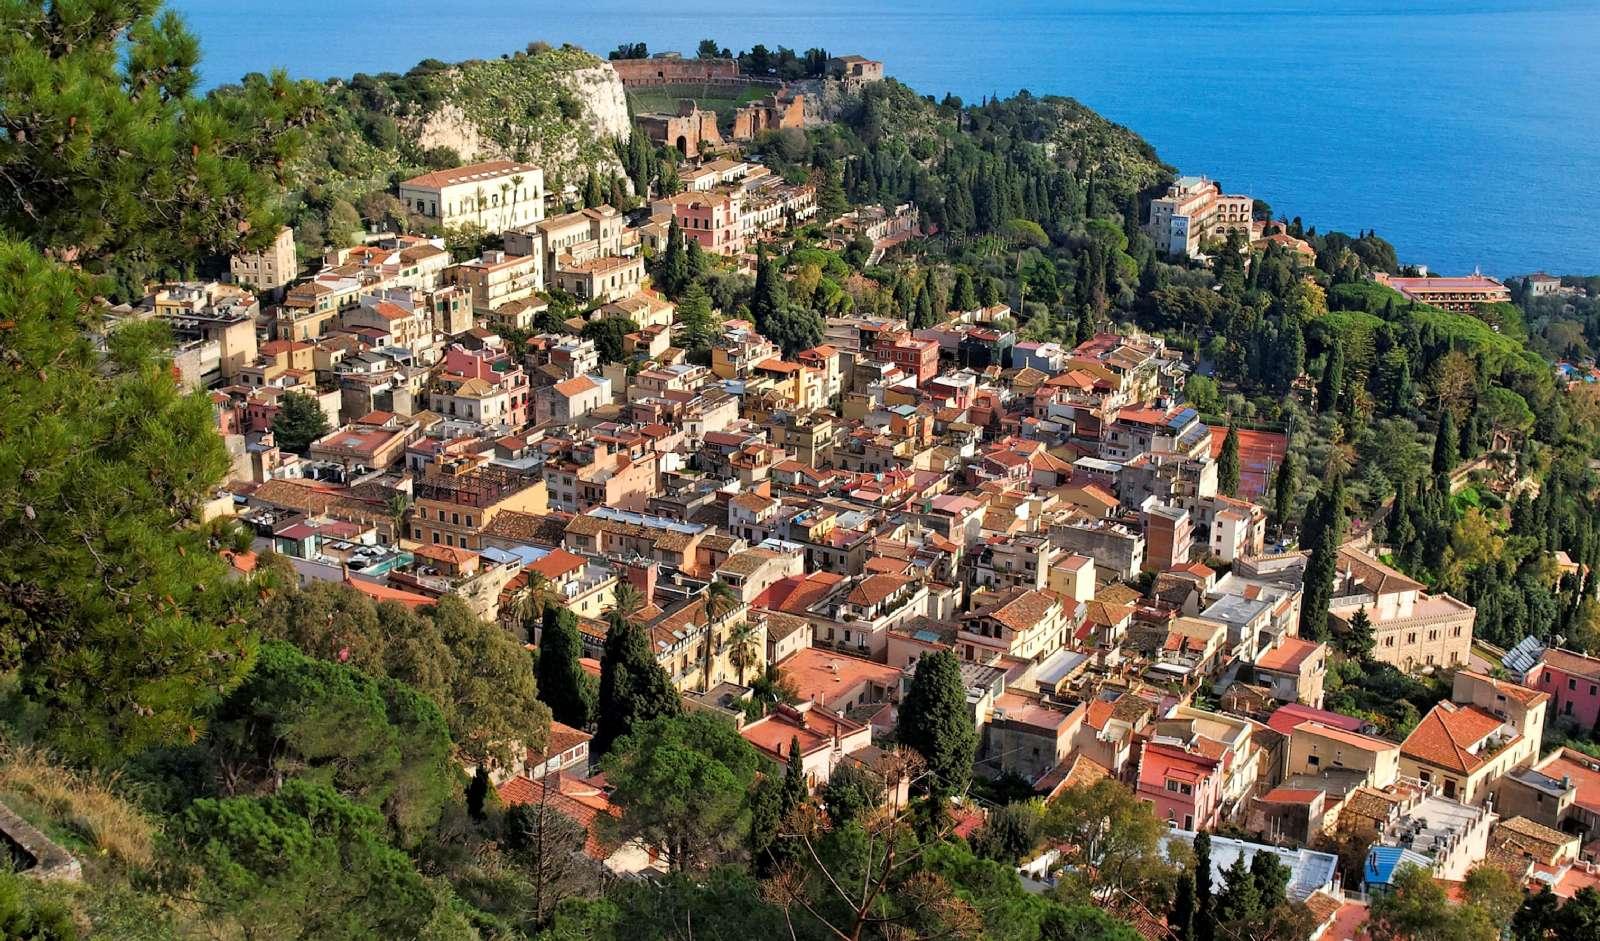 Taormina ligger pittoresk placeret